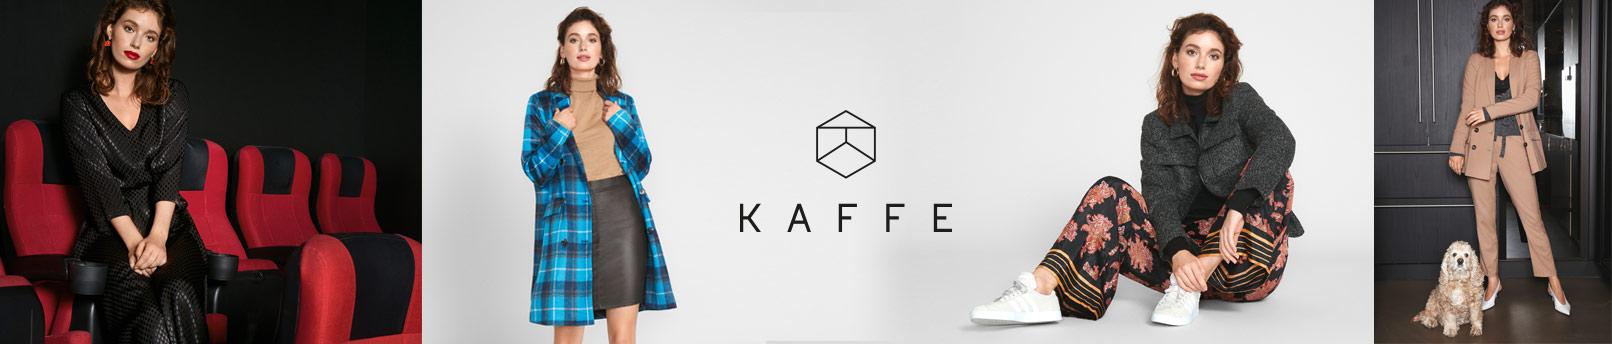 KAFFE shoppen